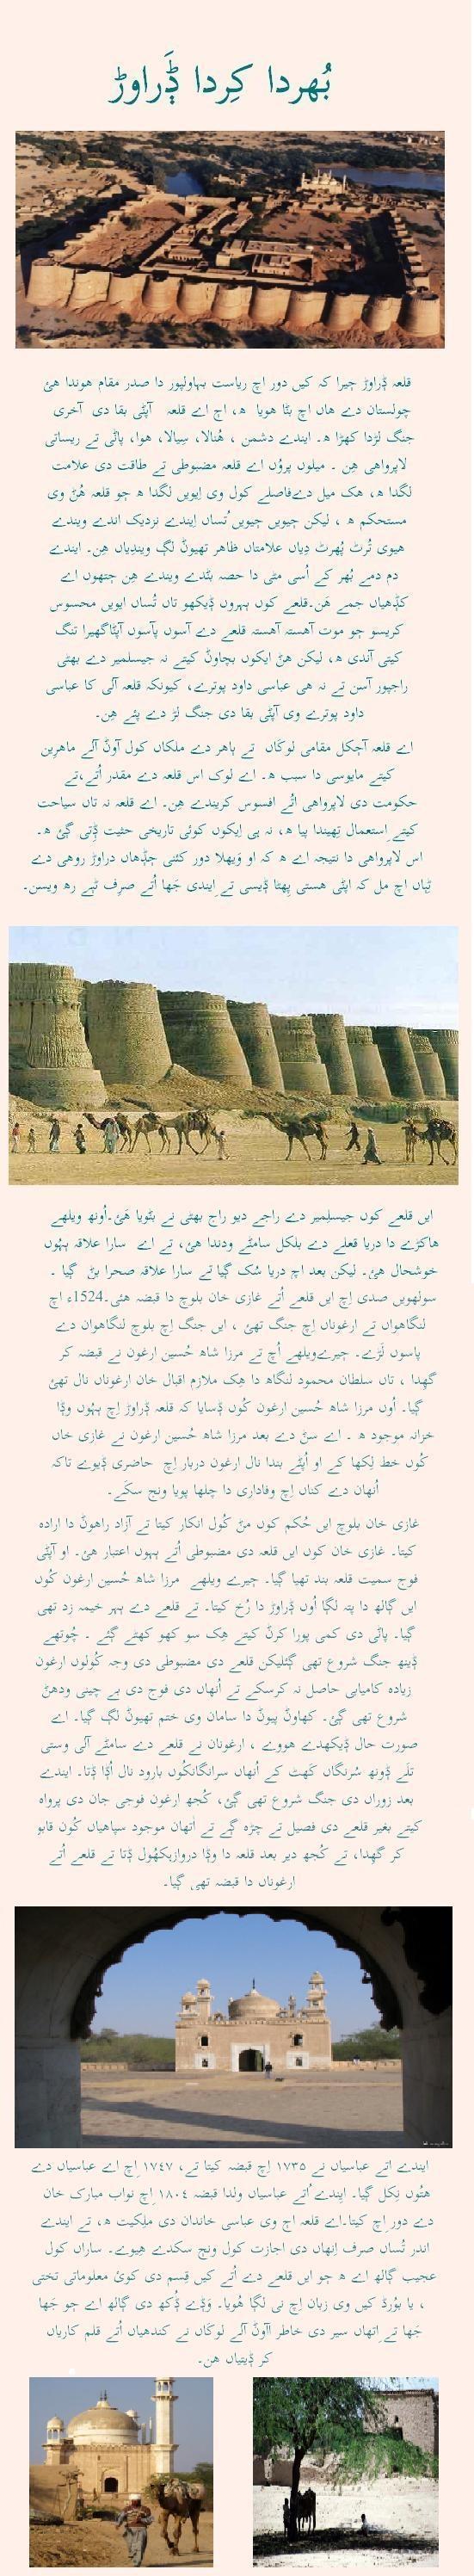 Bhurda Kirda Derawar (Ghulam Abbas Siyal) Part 1